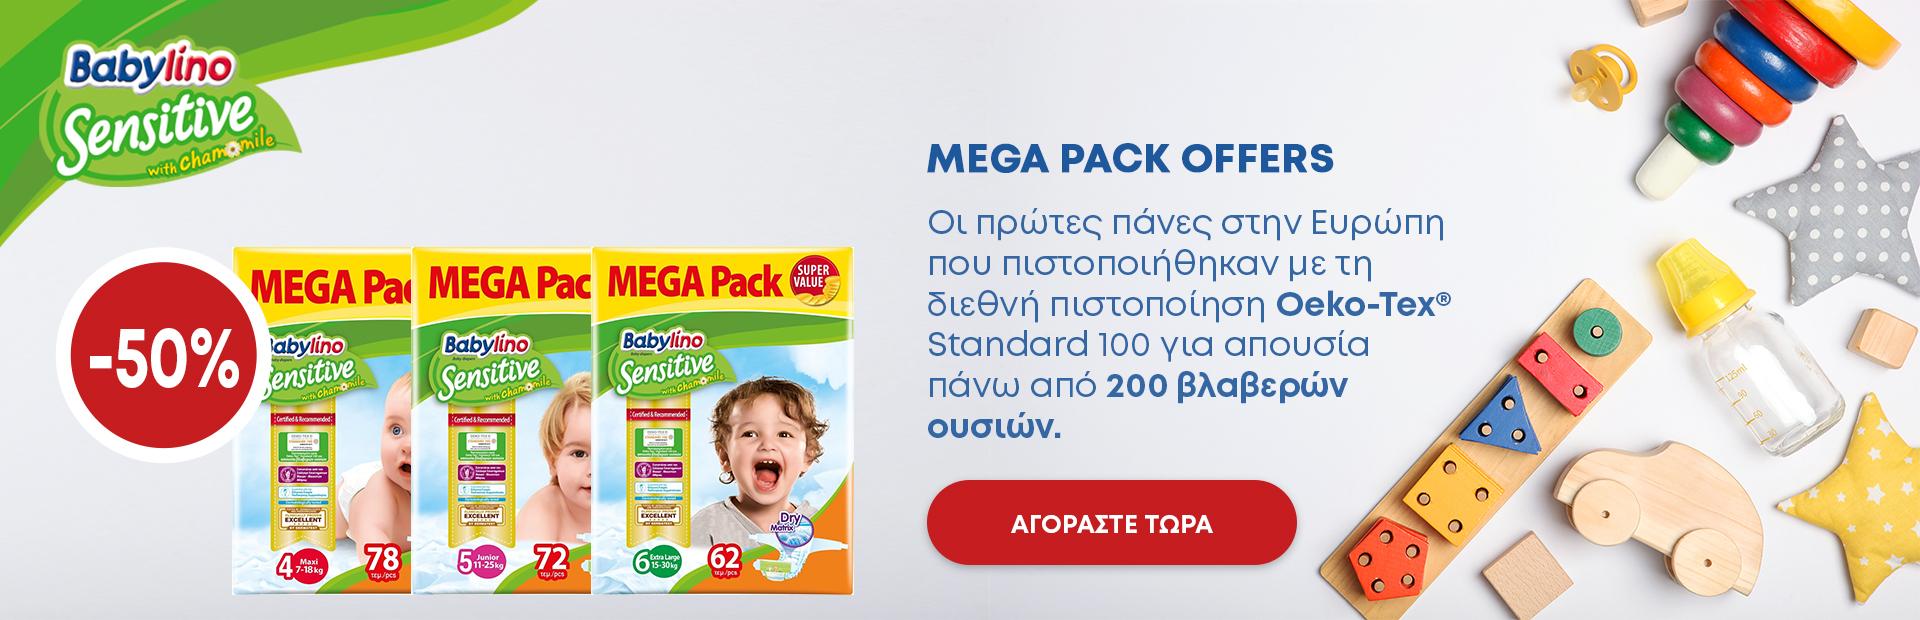 Babylino mega pack discount